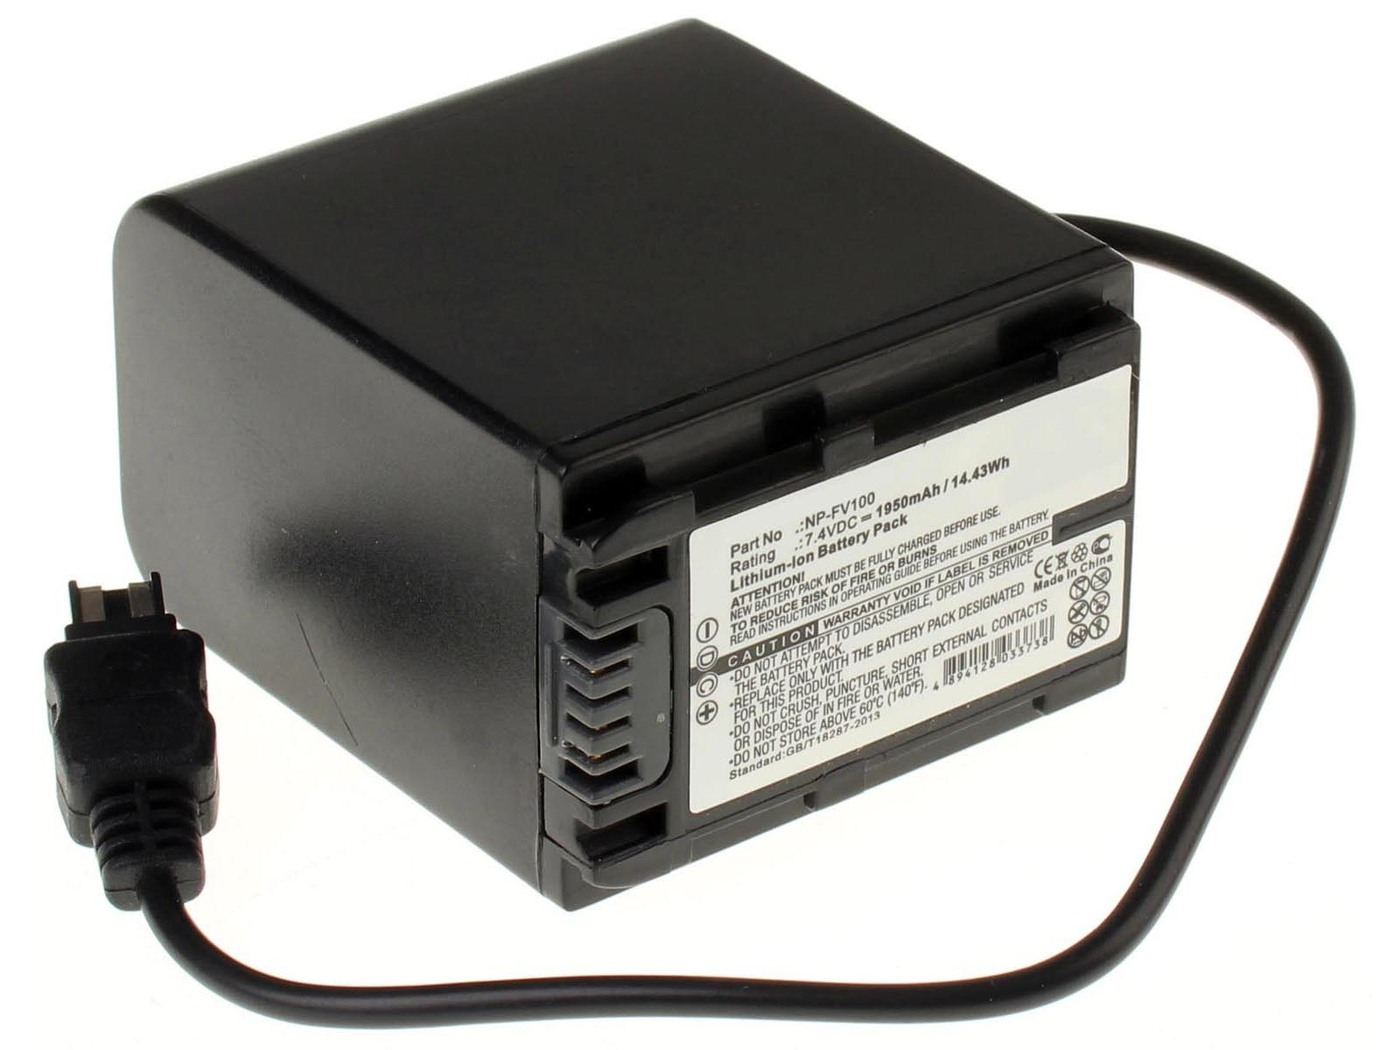 Аккумуляторная батарея iBatt iB-A1-F451 1950mAh для камер Sony NP-FV50, NP-FV100, NP-FV70, NP-FV30, NP-FV90,